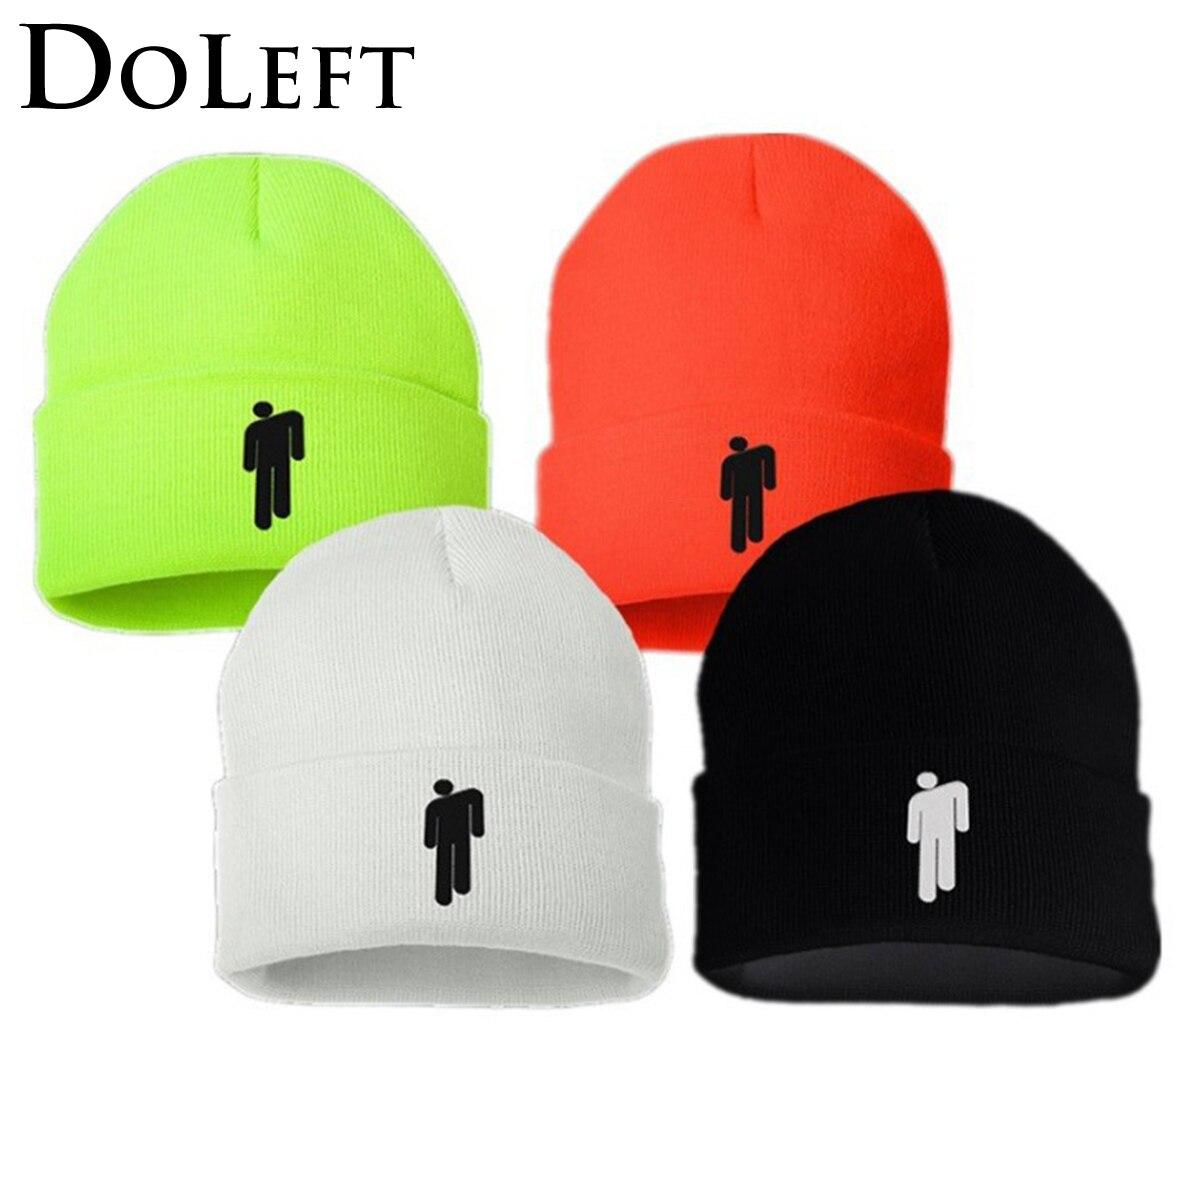 2019 Billie Eilish Beanie หมวกถัก Unisex Solid Hip-Hop Skullies หมวกถักหมวกฤดูหนาว 12 สี Casual กีฬากลางแจ้งหมวก